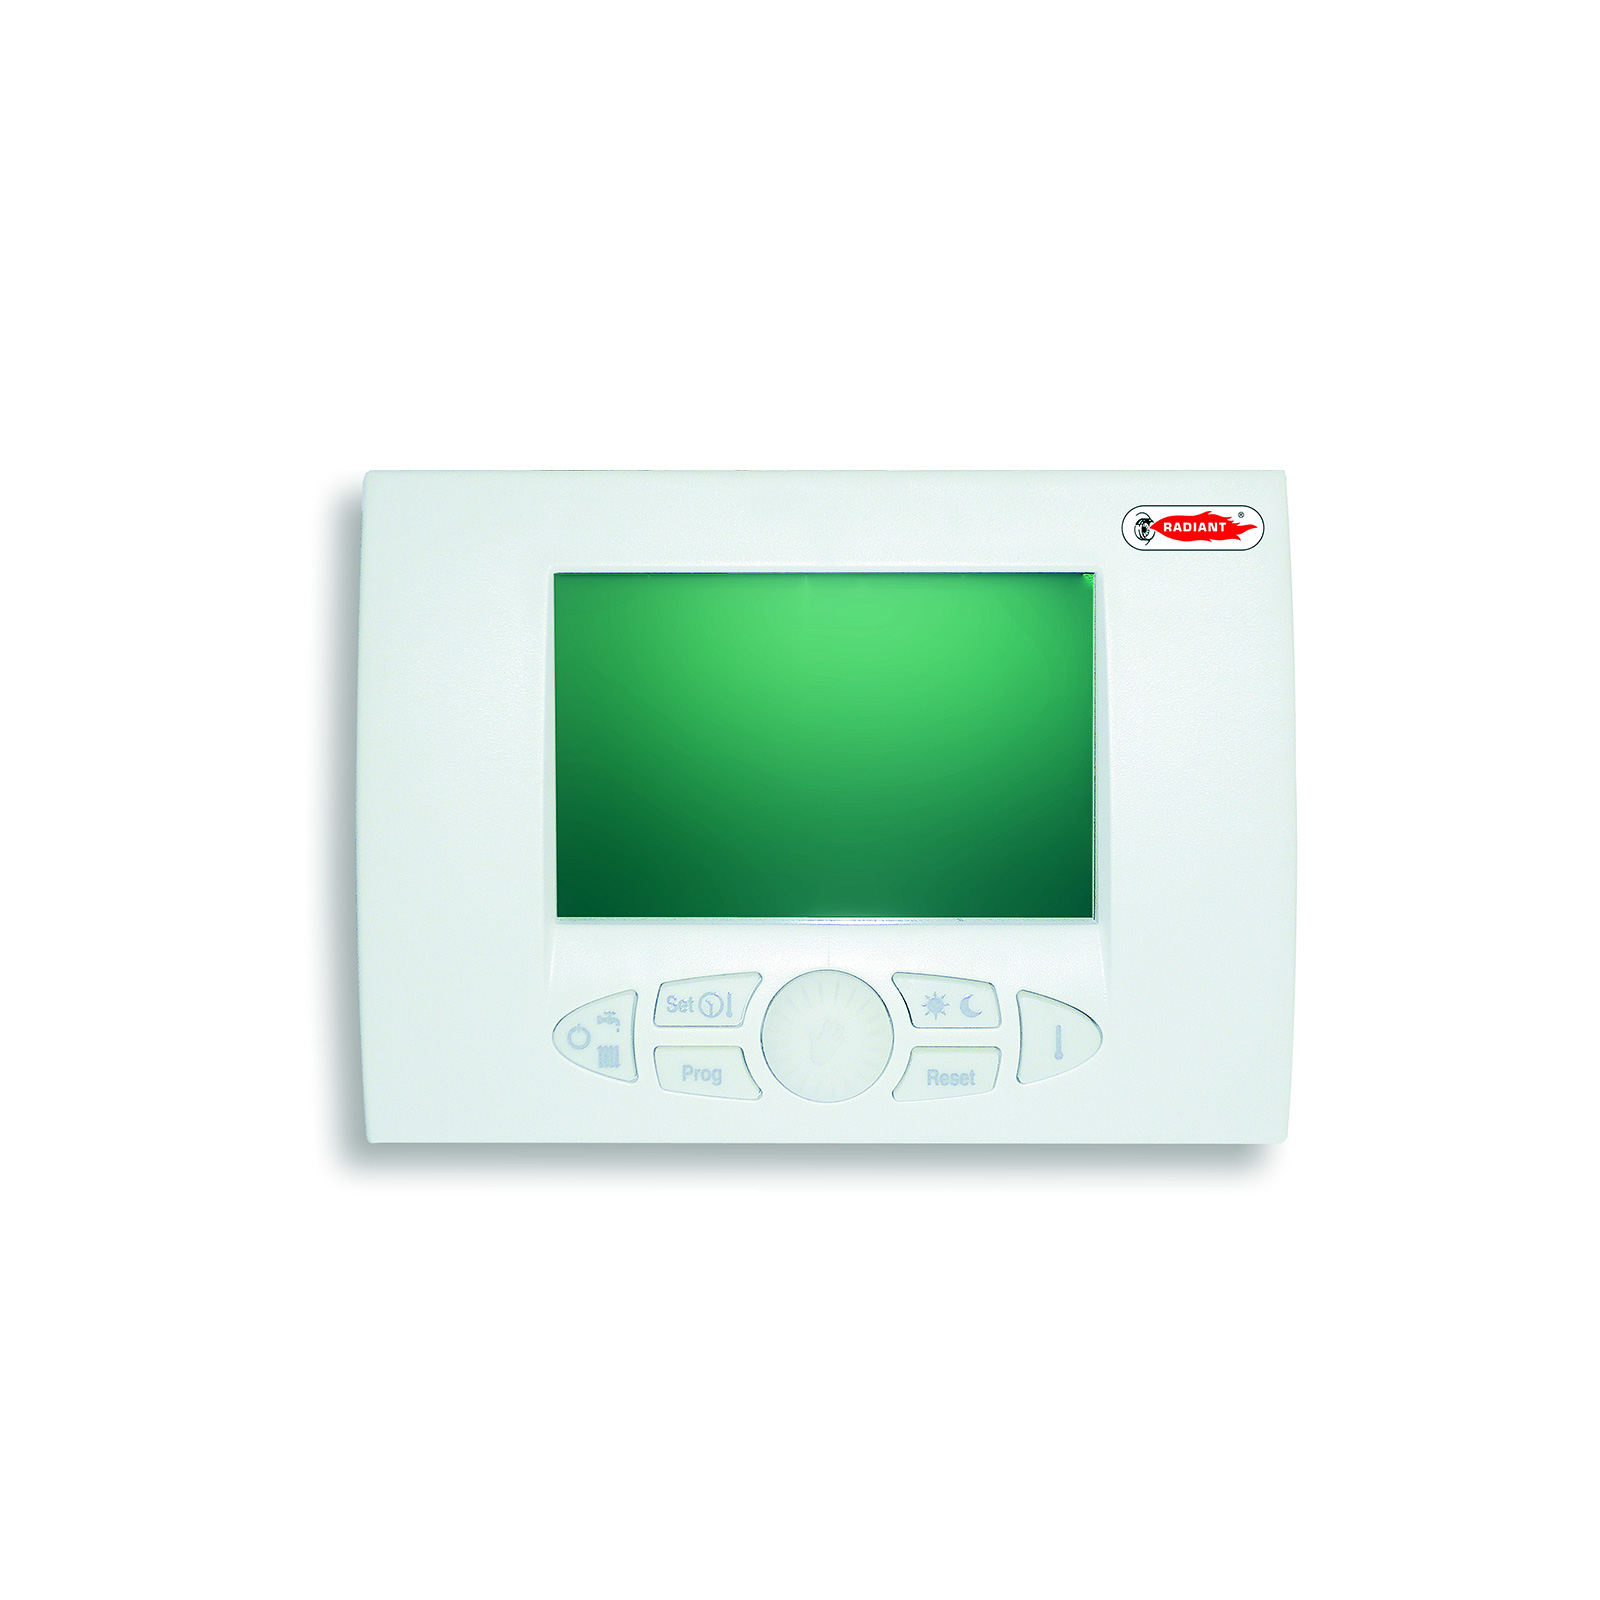 Easy remote controller from Flexiheat UK; Class 5 modulating boiler controller range;bosch easycontrol;stock;website;inc vat;delivery;stock;England;delivery;intelligent filling system;worcester greenstar 8000:stock;inc vat